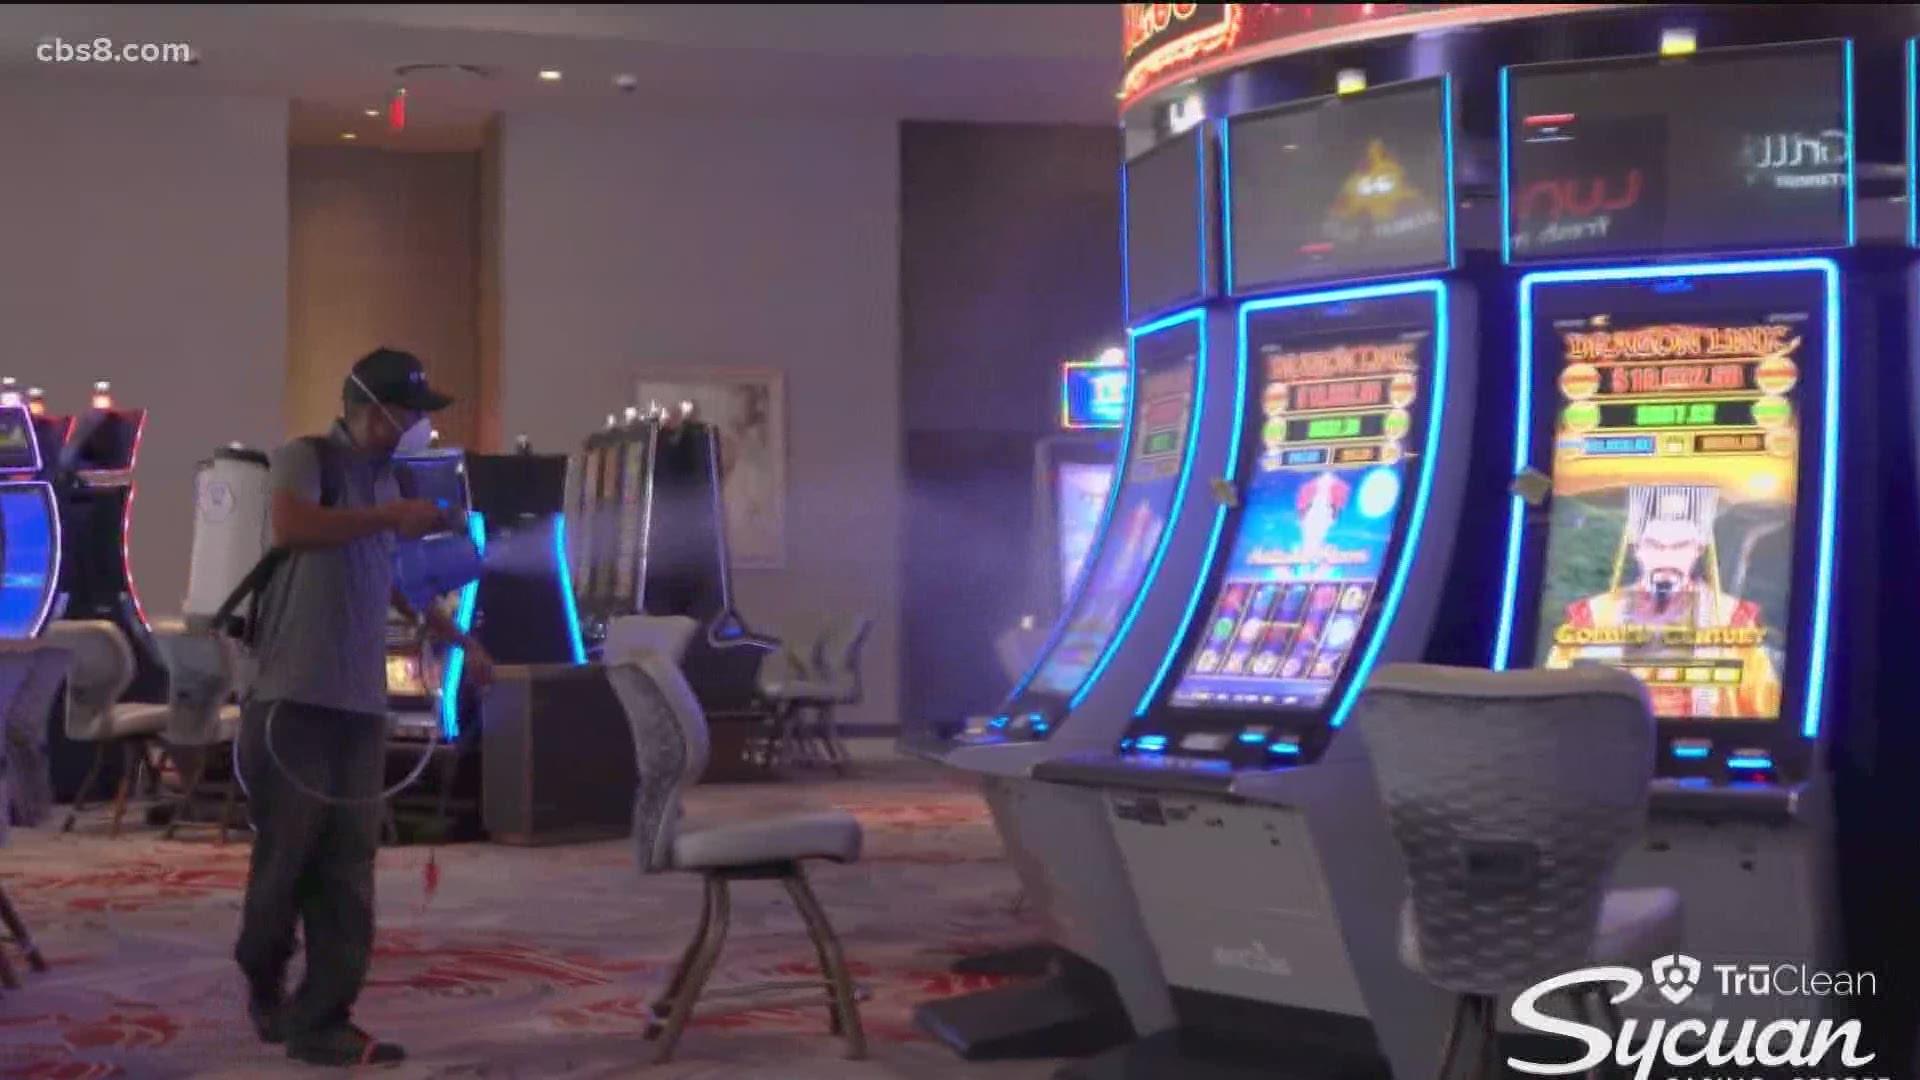 casino planning consent